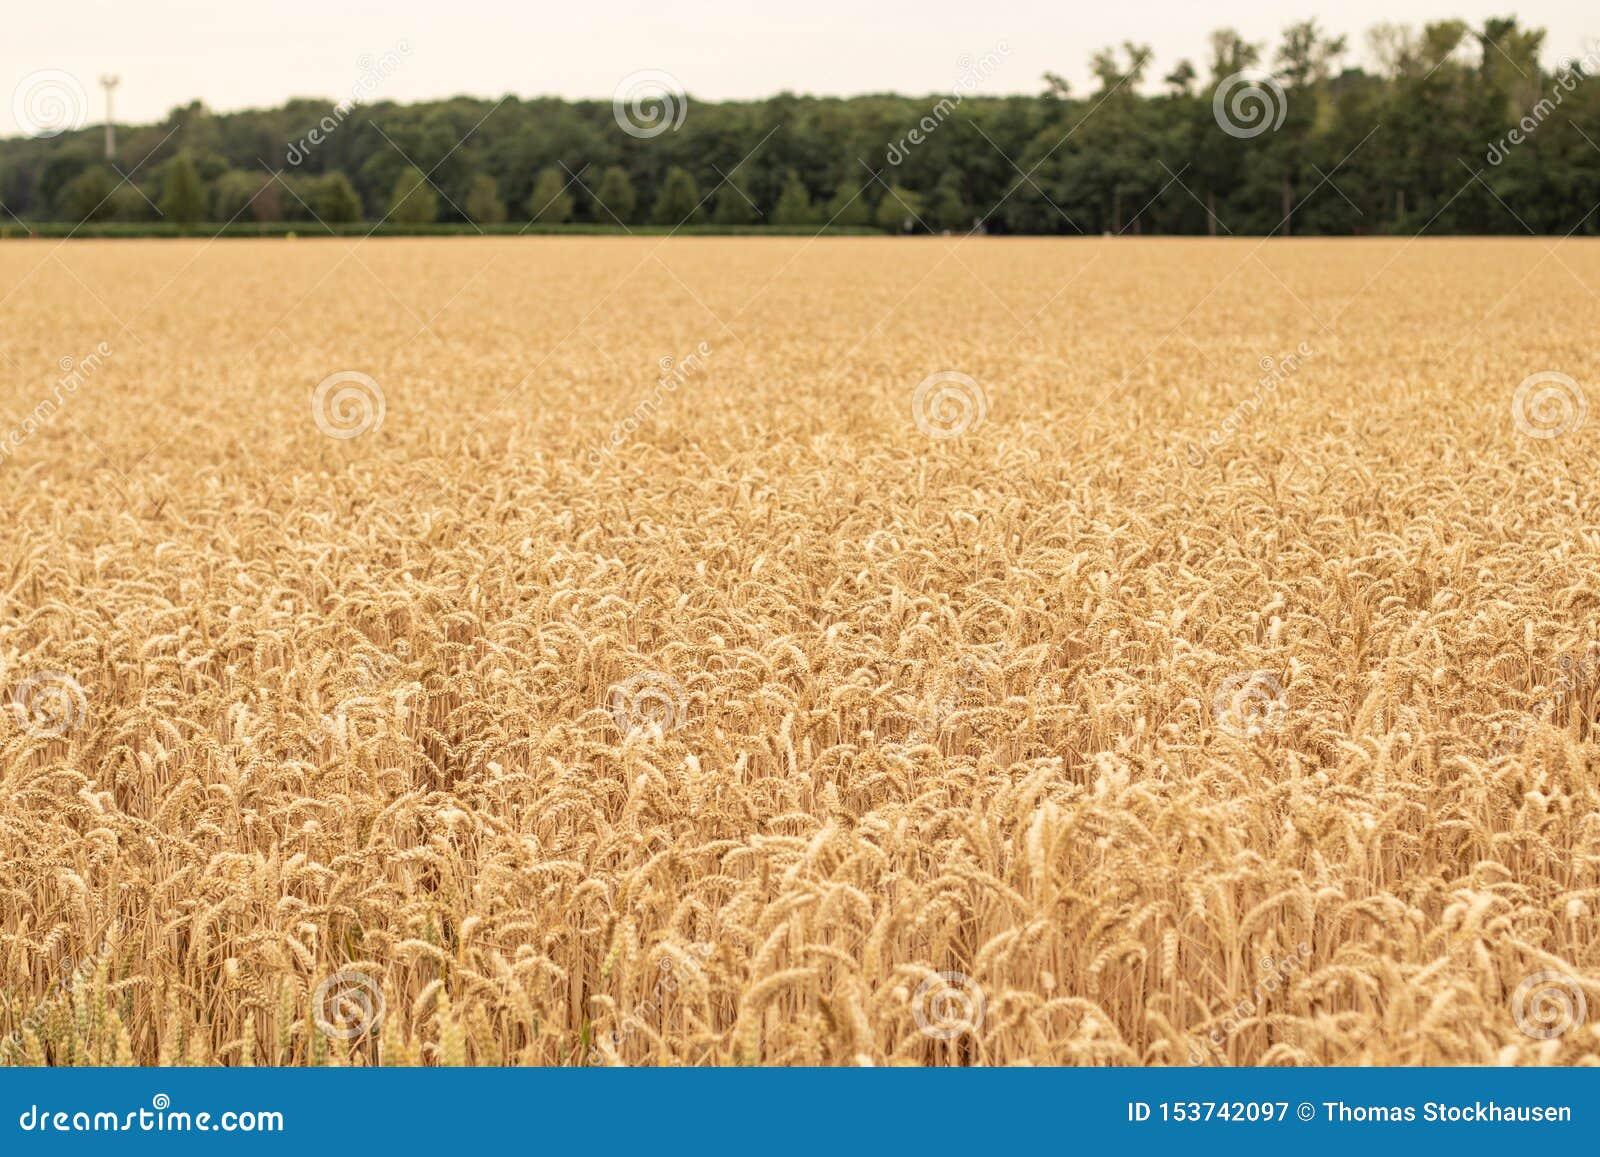 Wheath-Feld, kurz vor Ernte